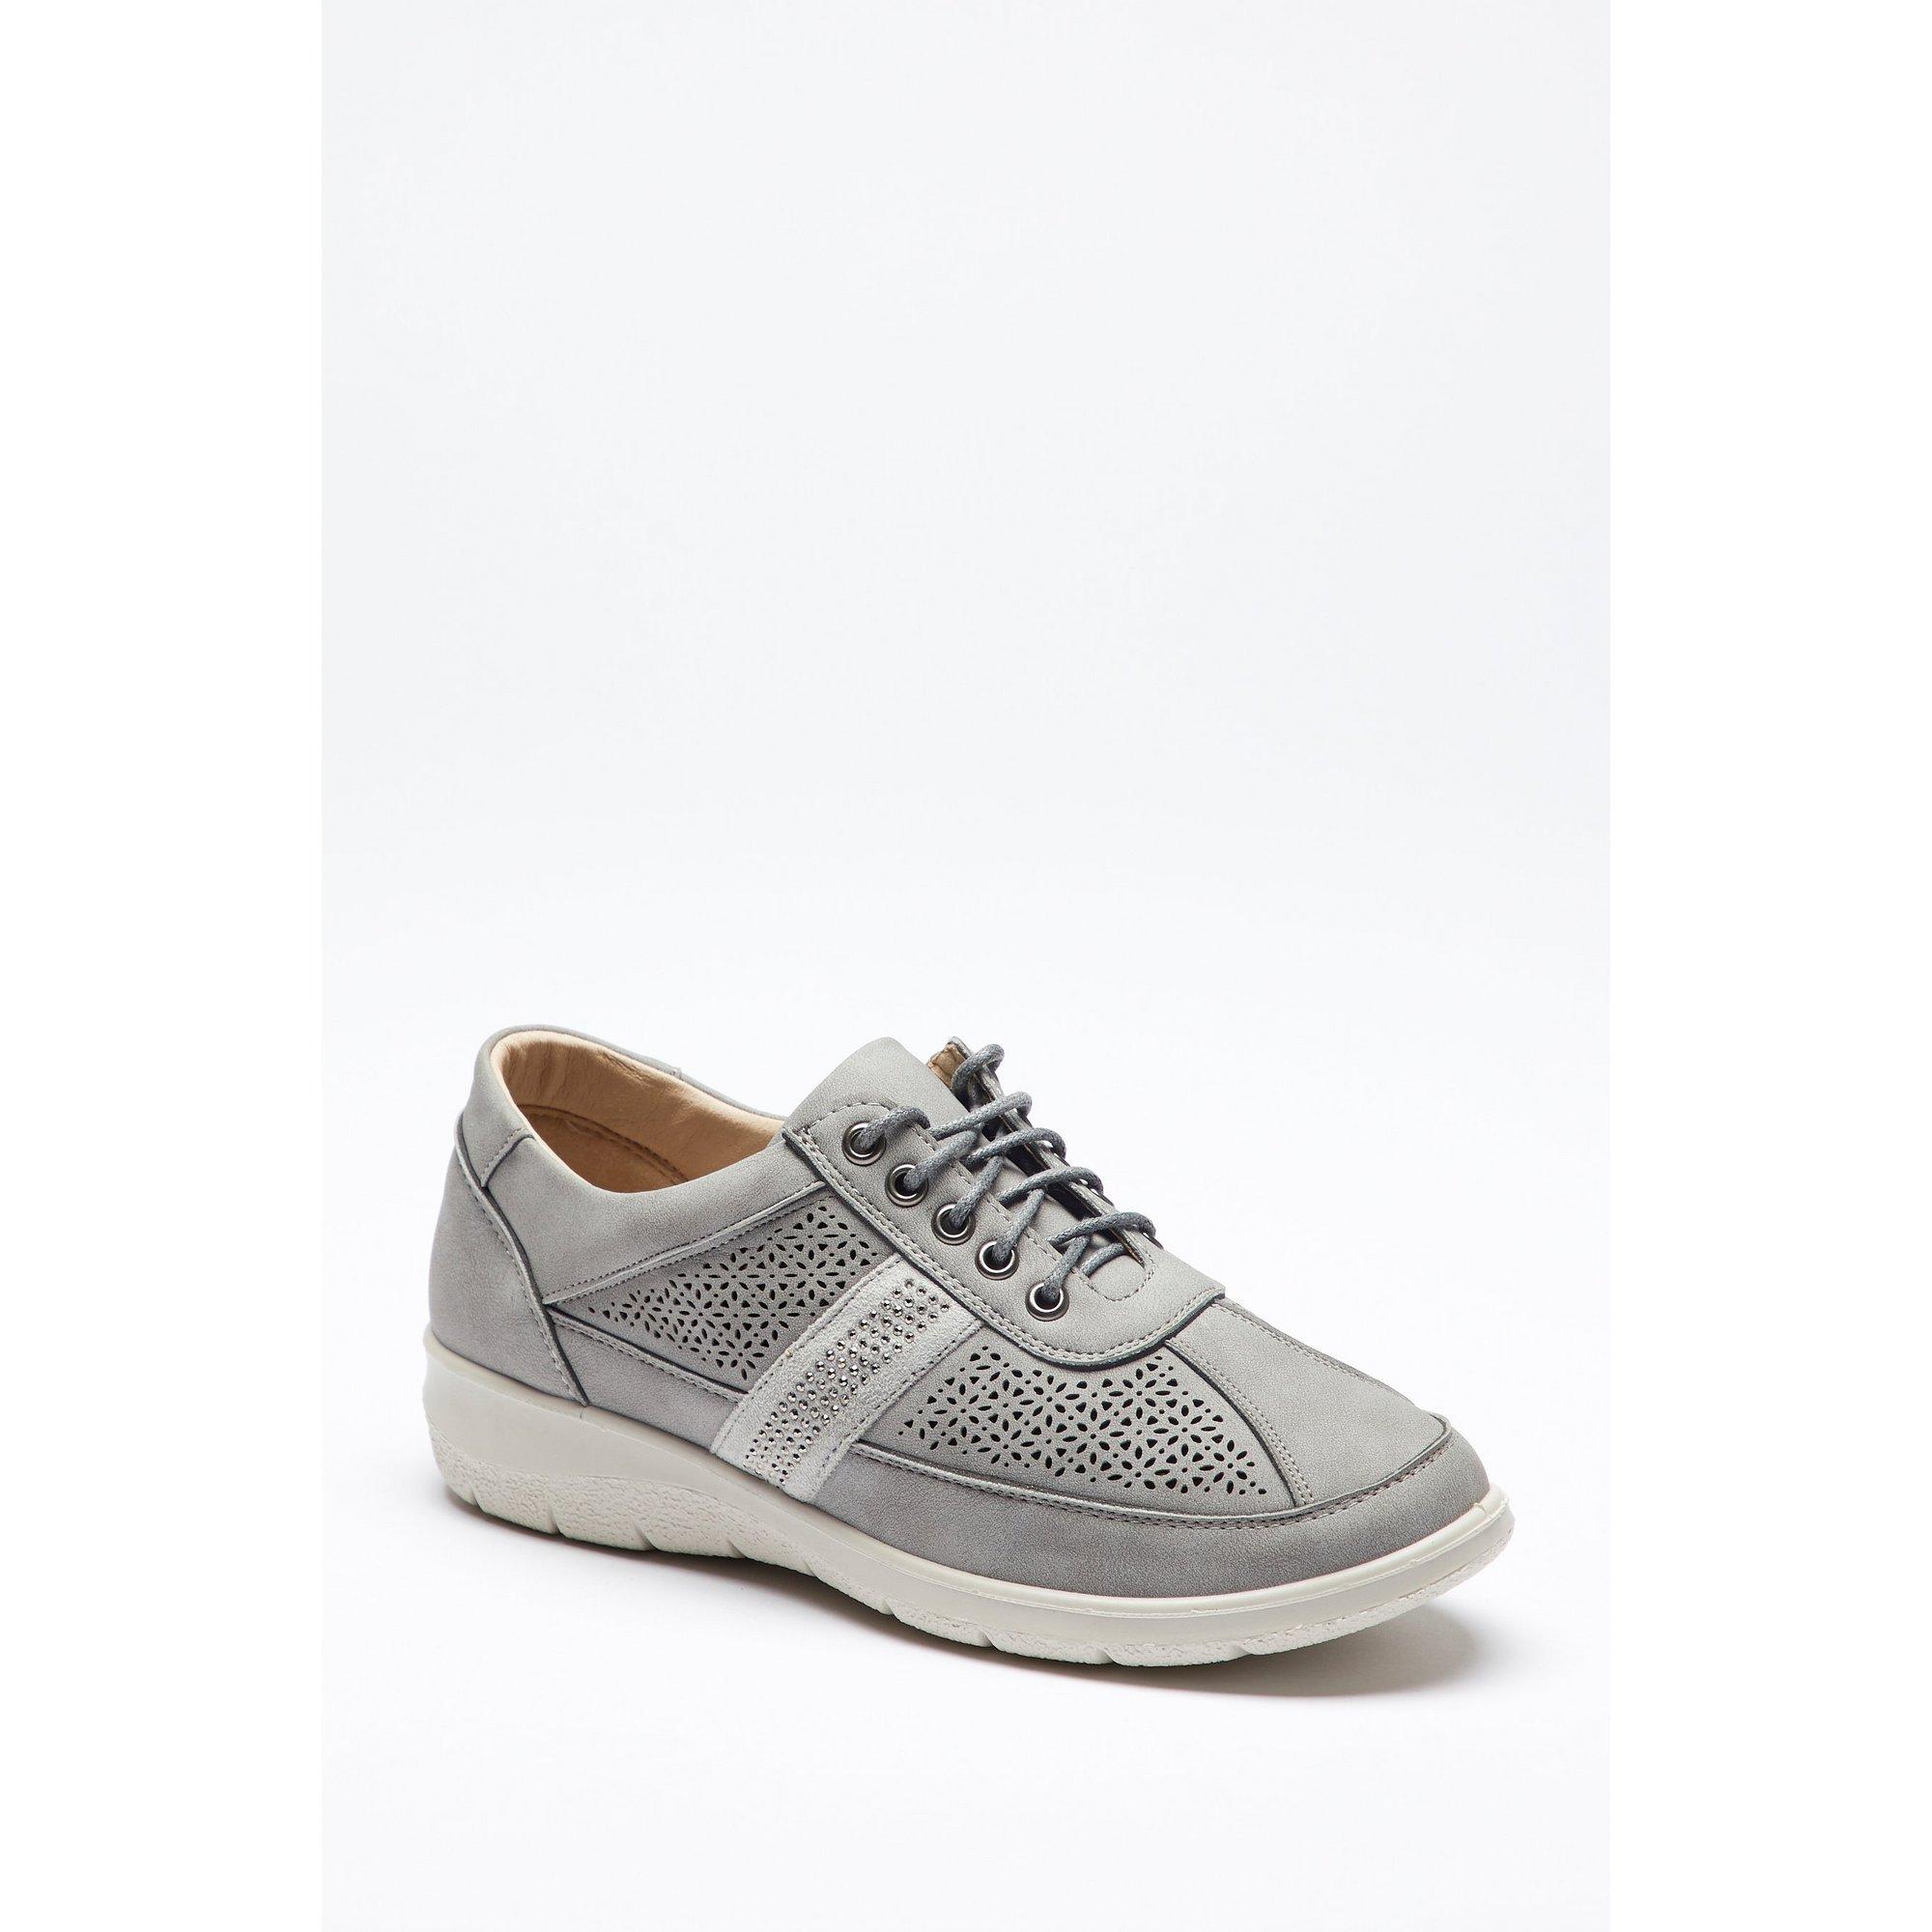 Image of Cushion Walk Diamante Lace Up Grey Shoes